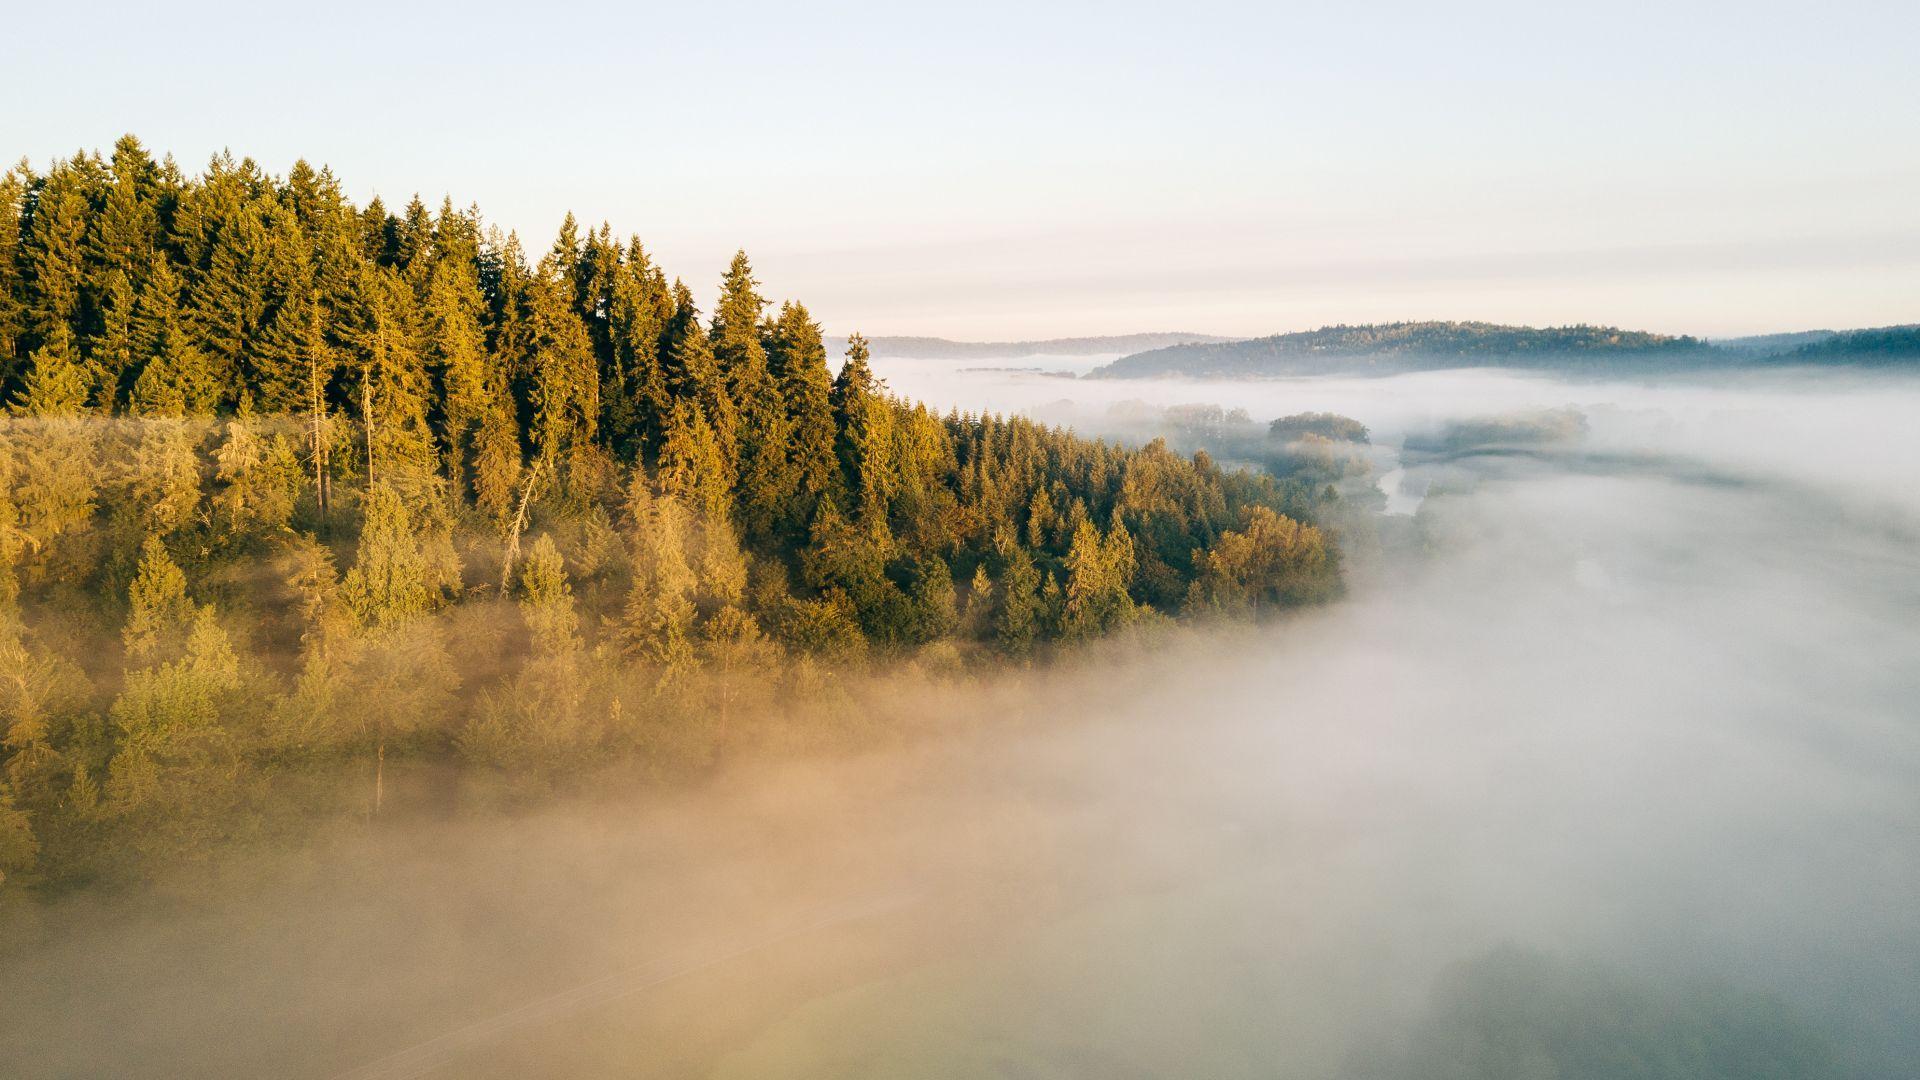 Fog Landscape 4k Horizontal พ นหล ง ธรรมชาต วอลเปเปอร